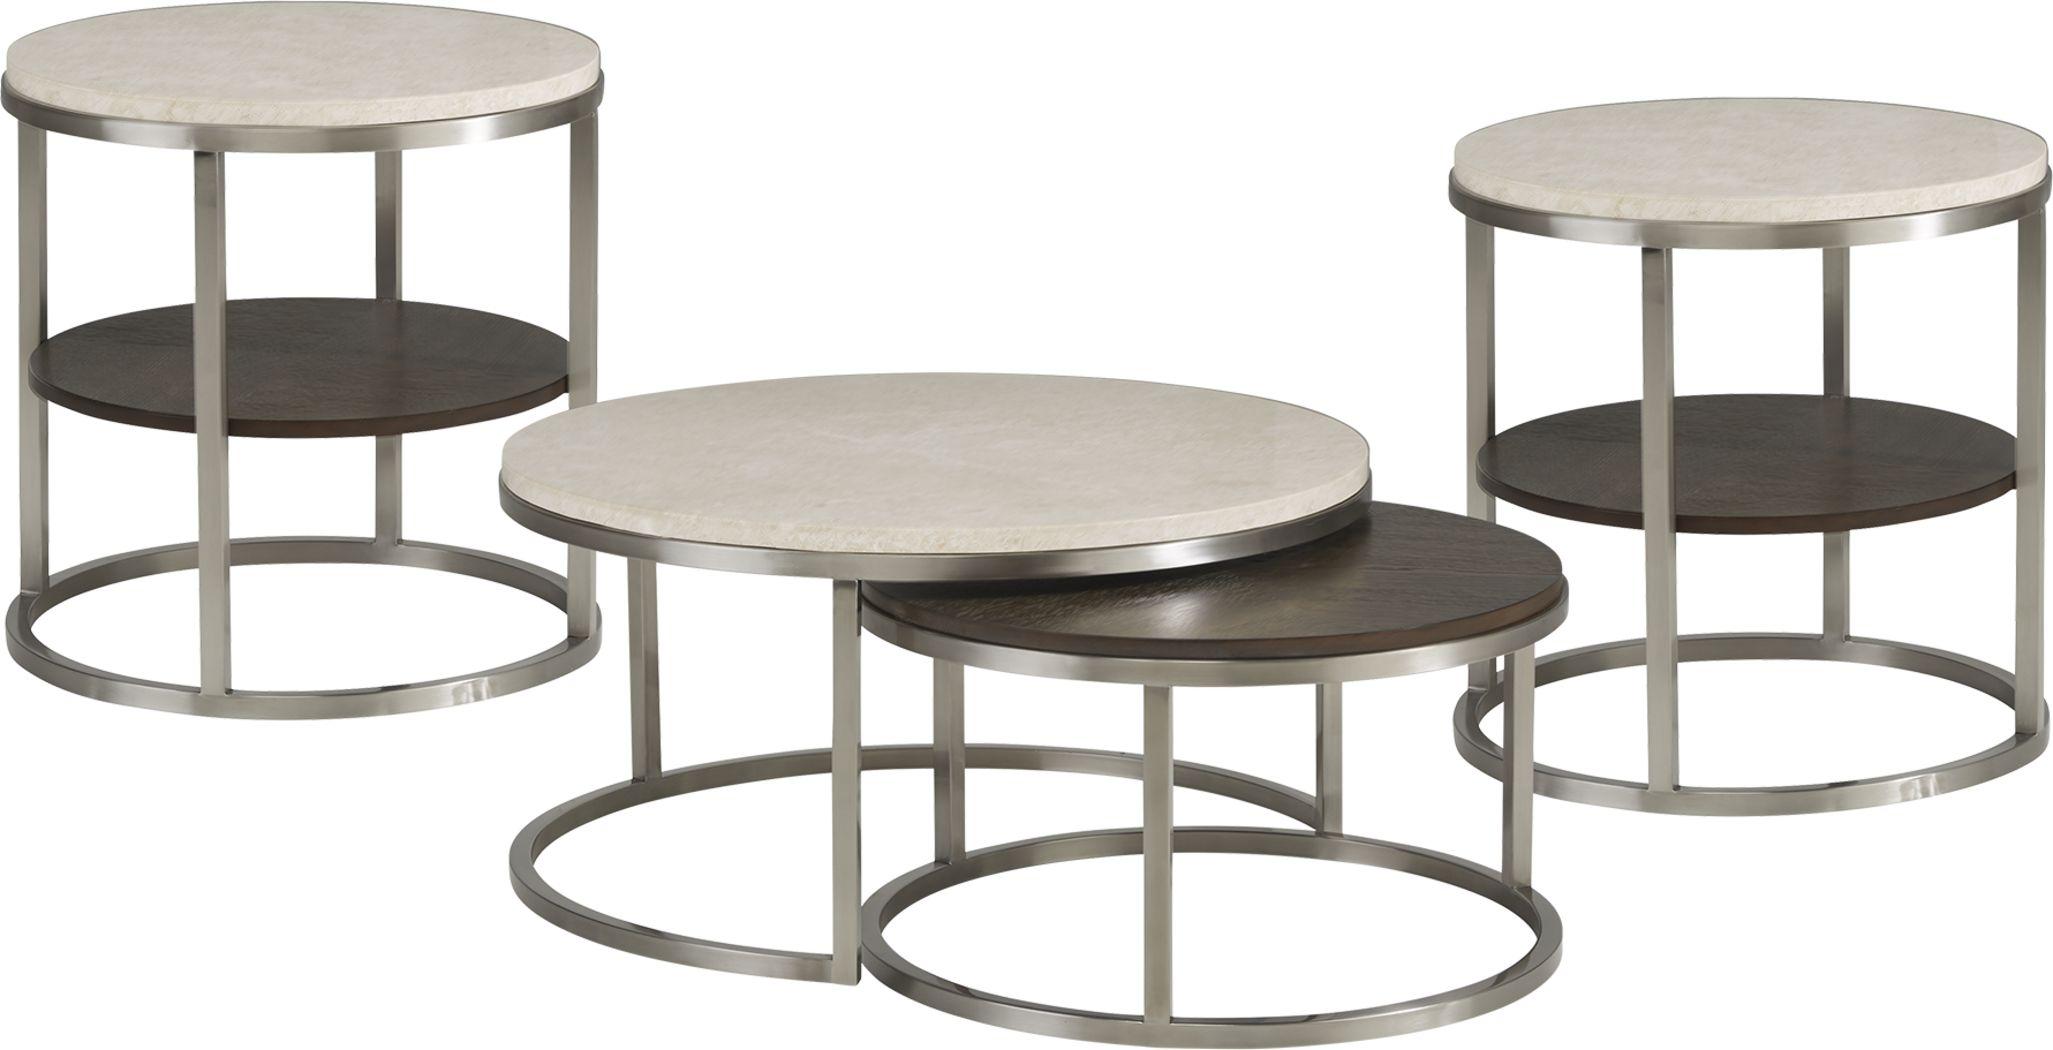 Eldren Tobacco 3 Pc Table Set